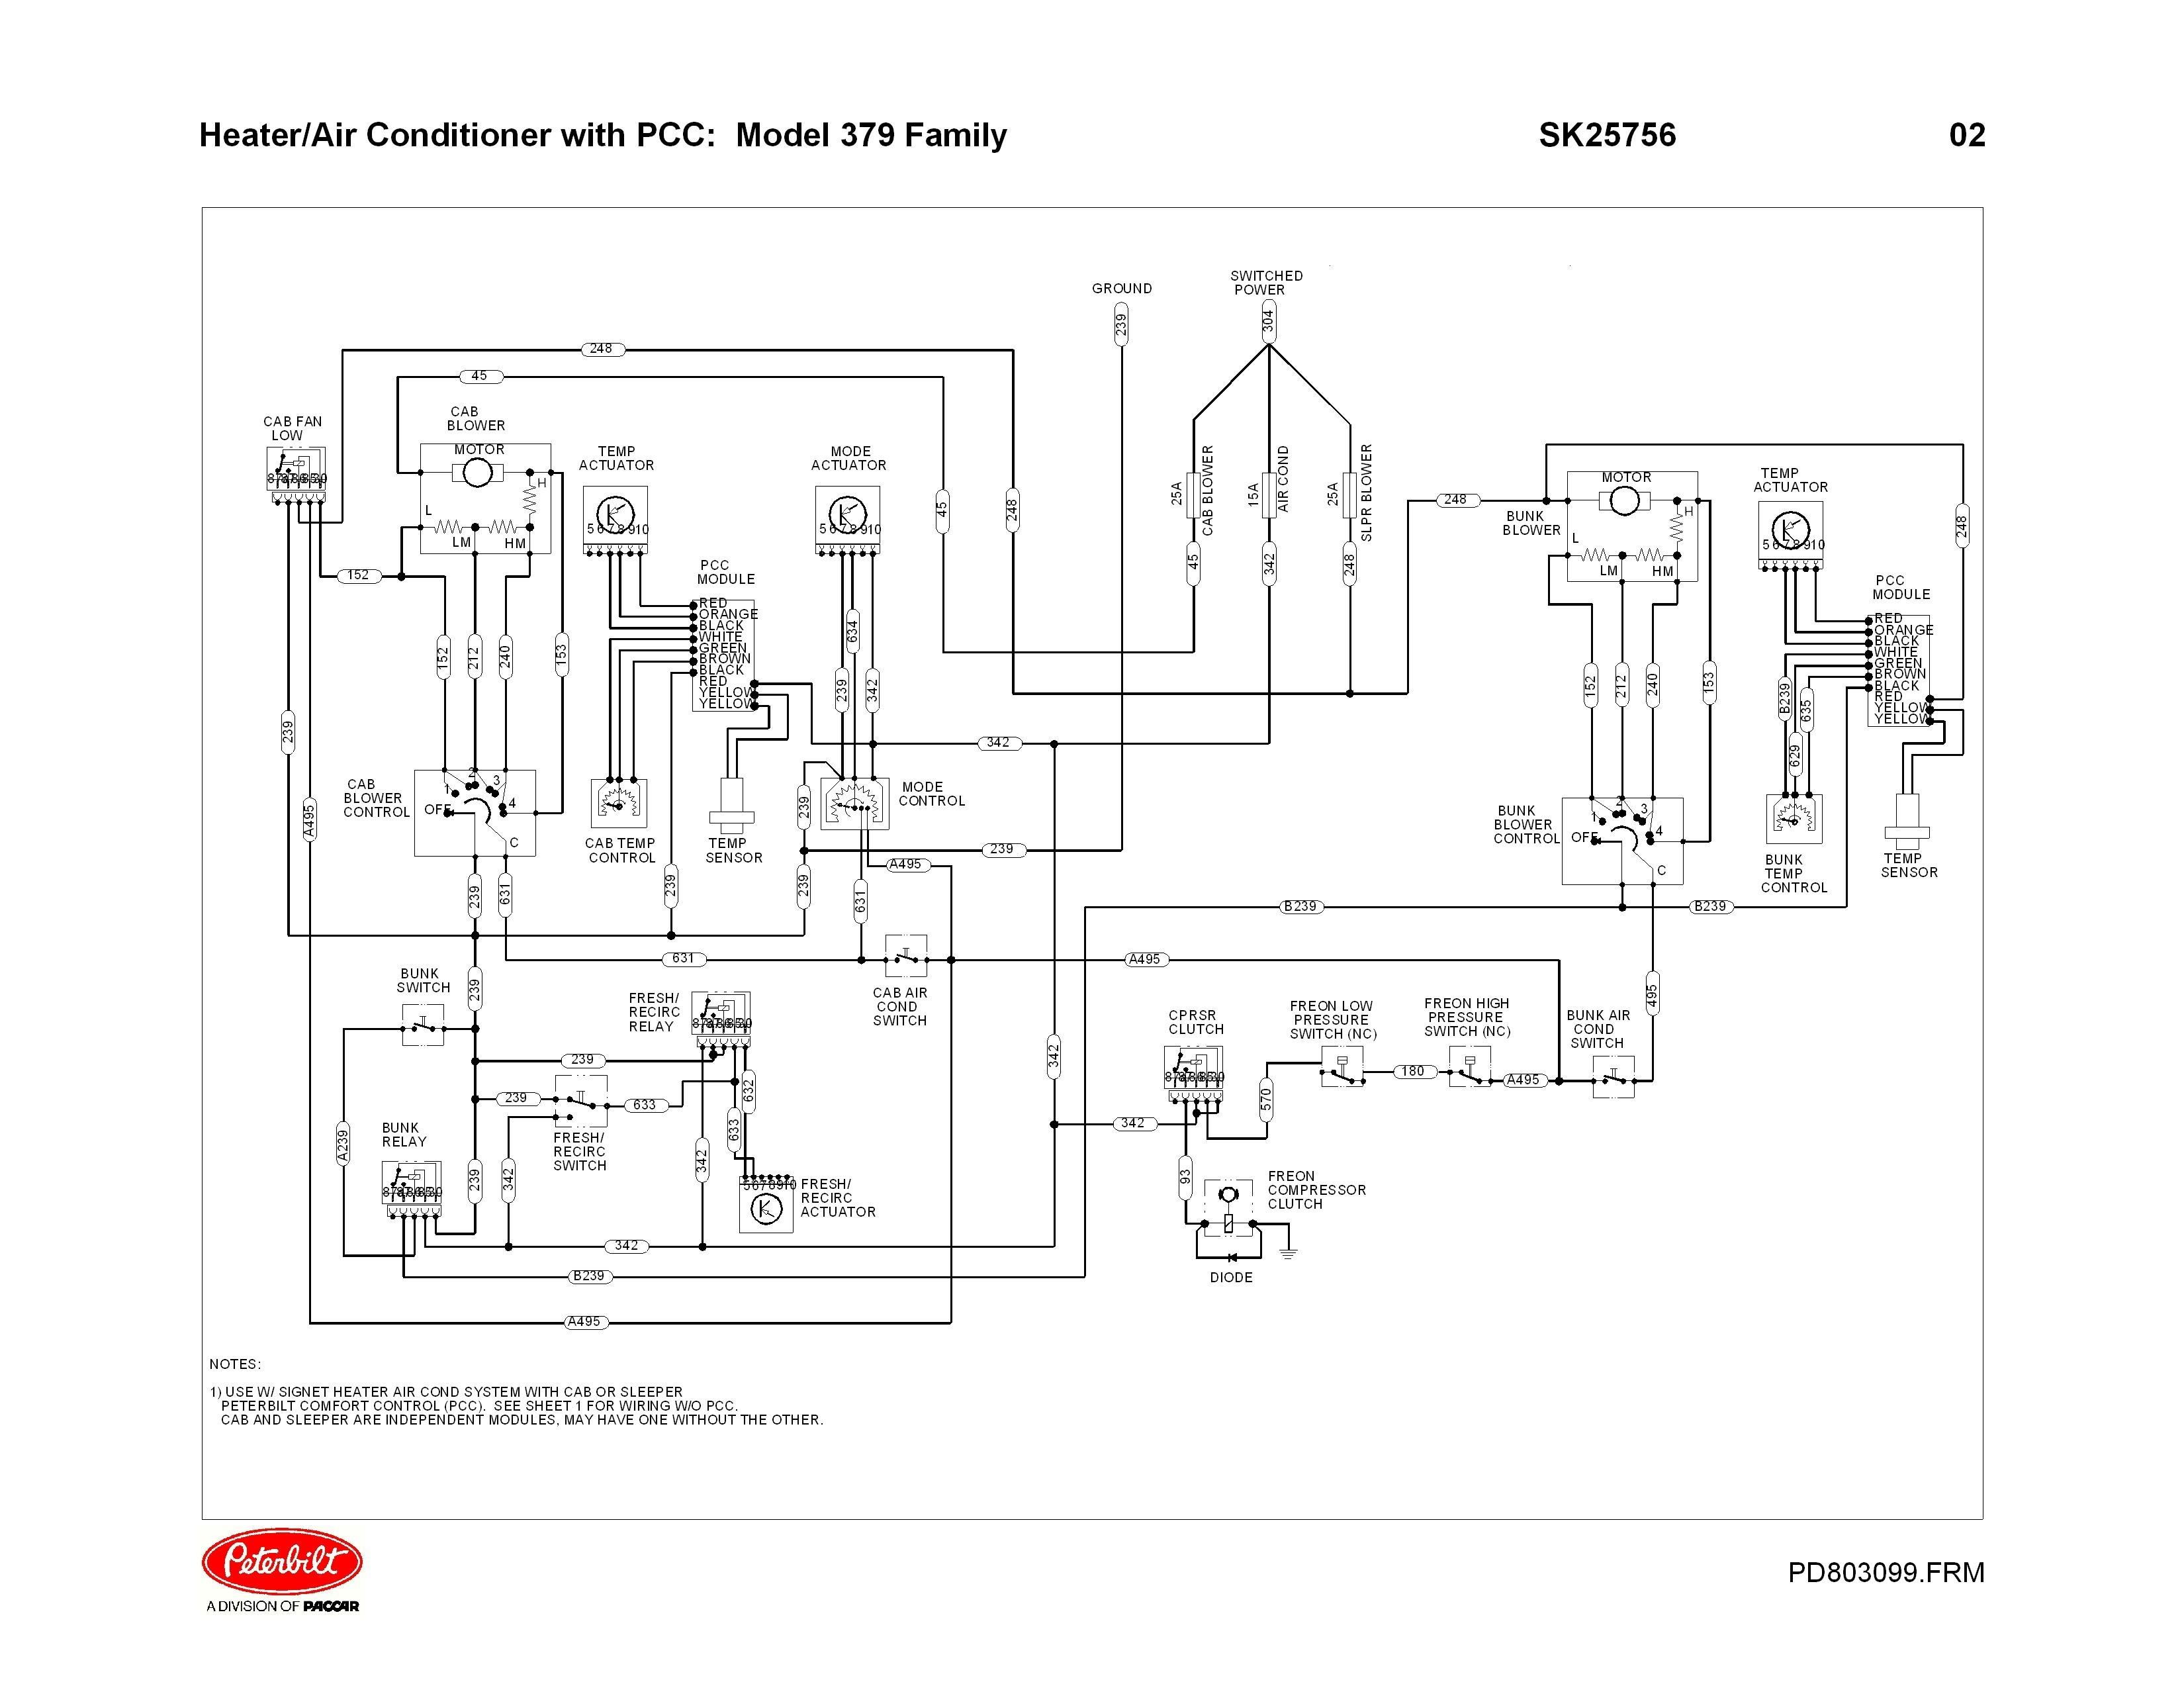 2007 peterbilt 379 wiring diagram mw 9932  peterbilt wiring diagram 2001 wiring diagram  mw 9932  peterbilt wiring diagram 2001